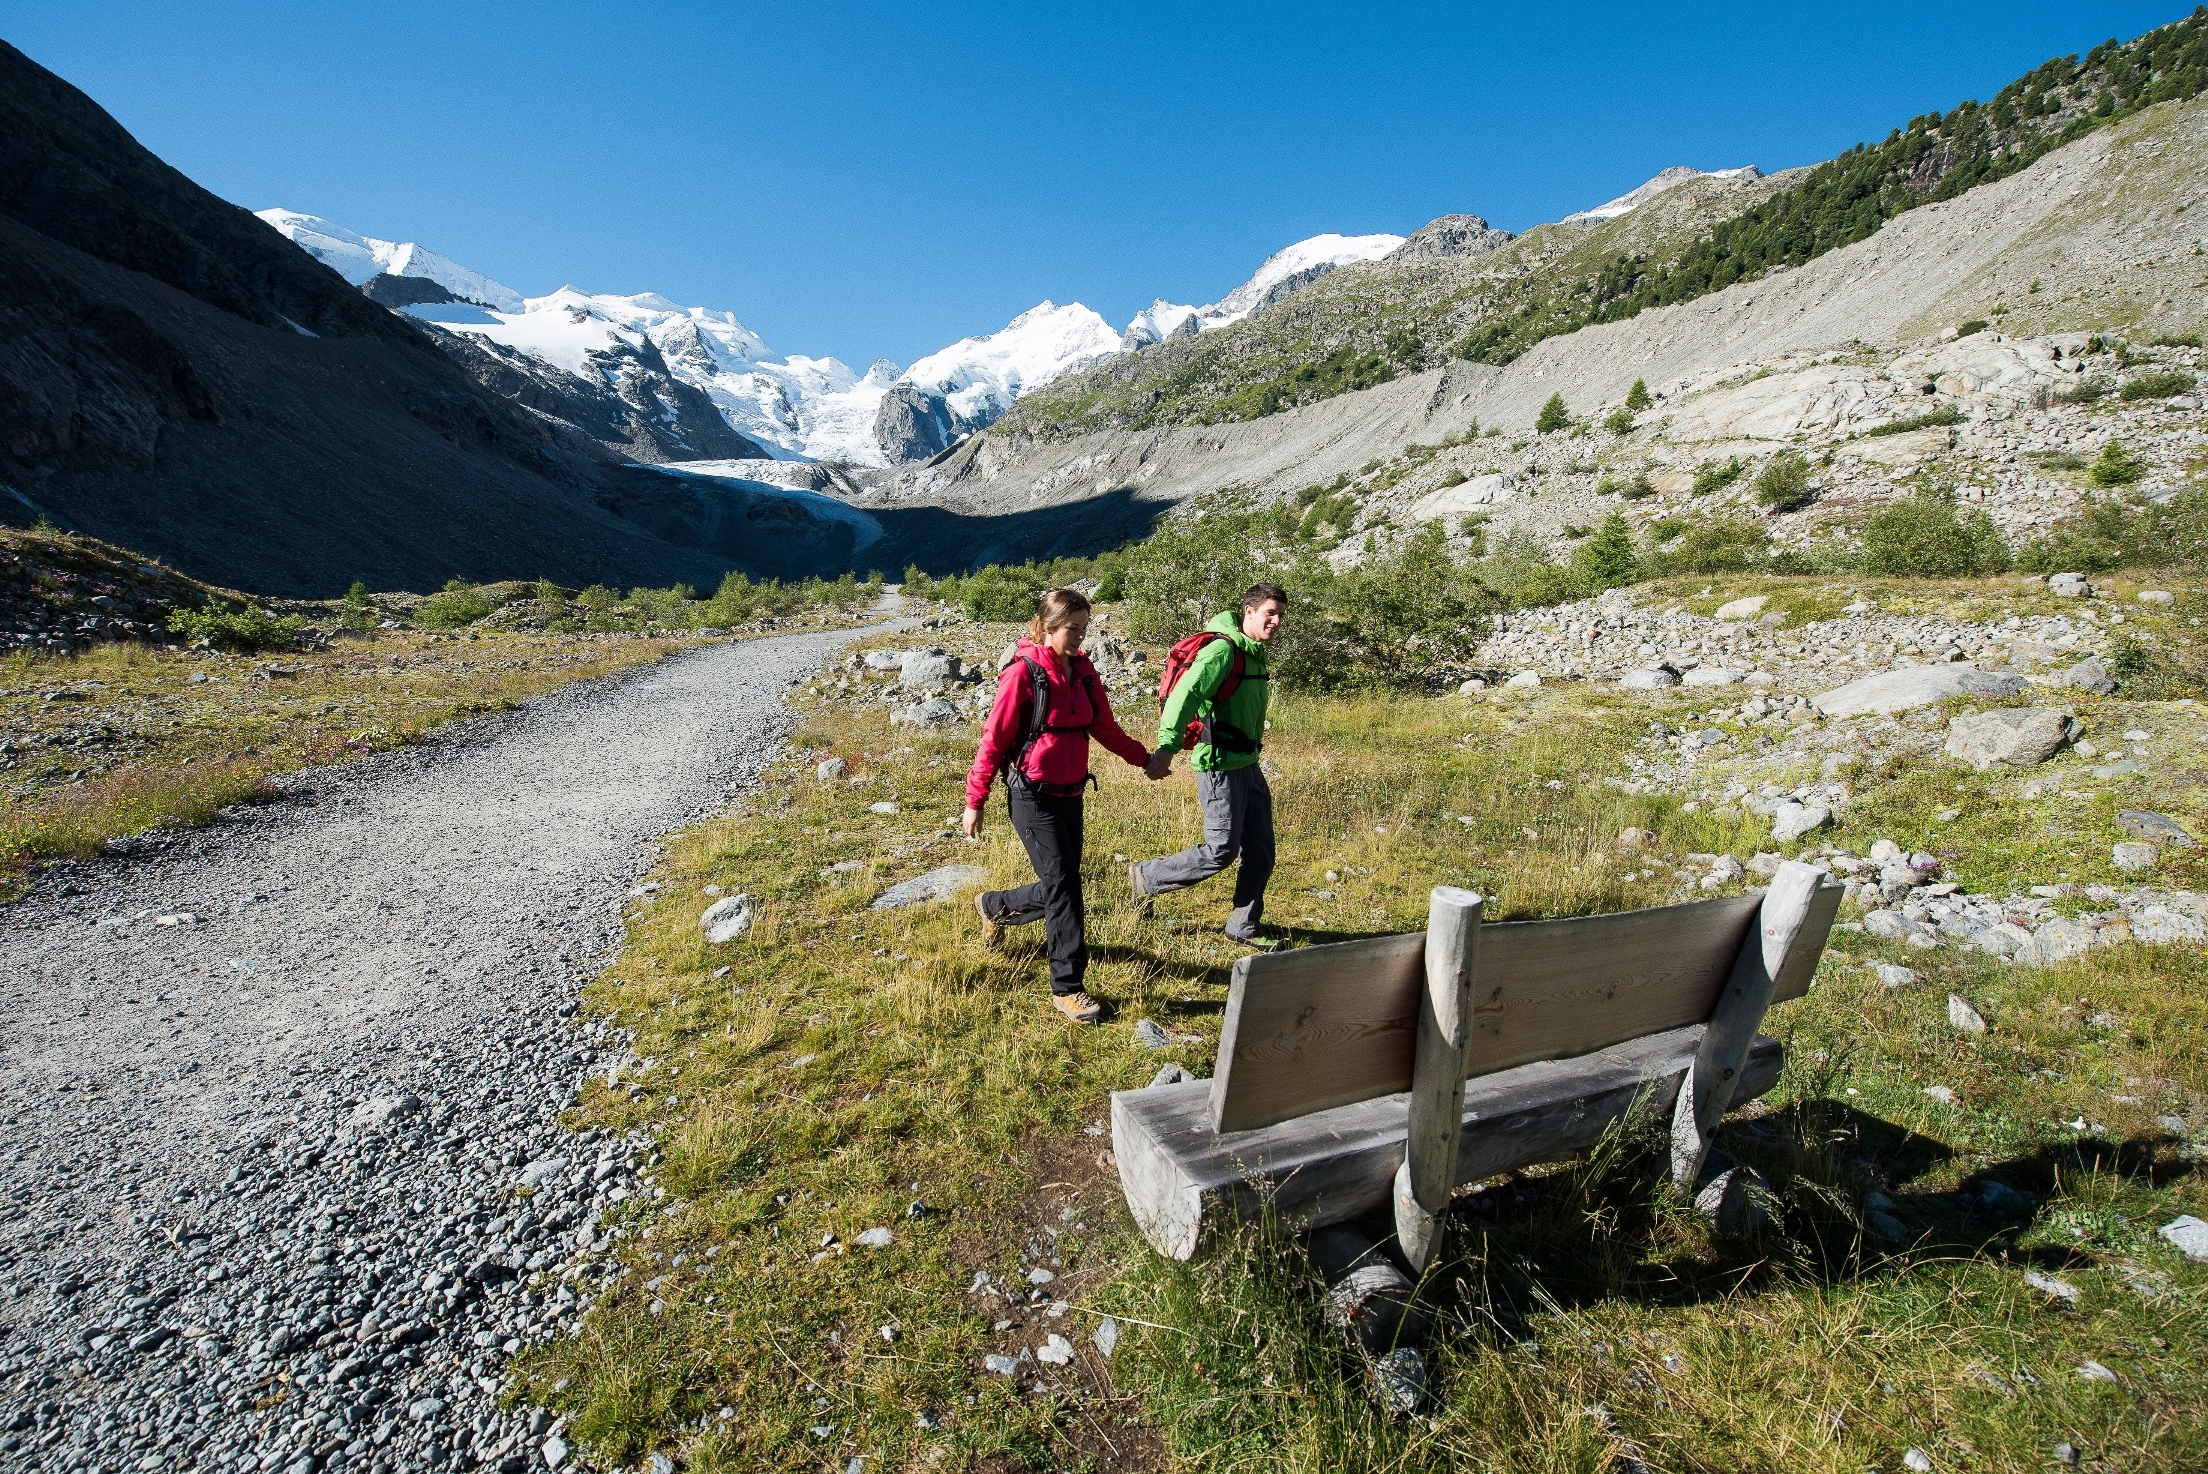 Seat bench Glacier walk Morteratsch Slide 1